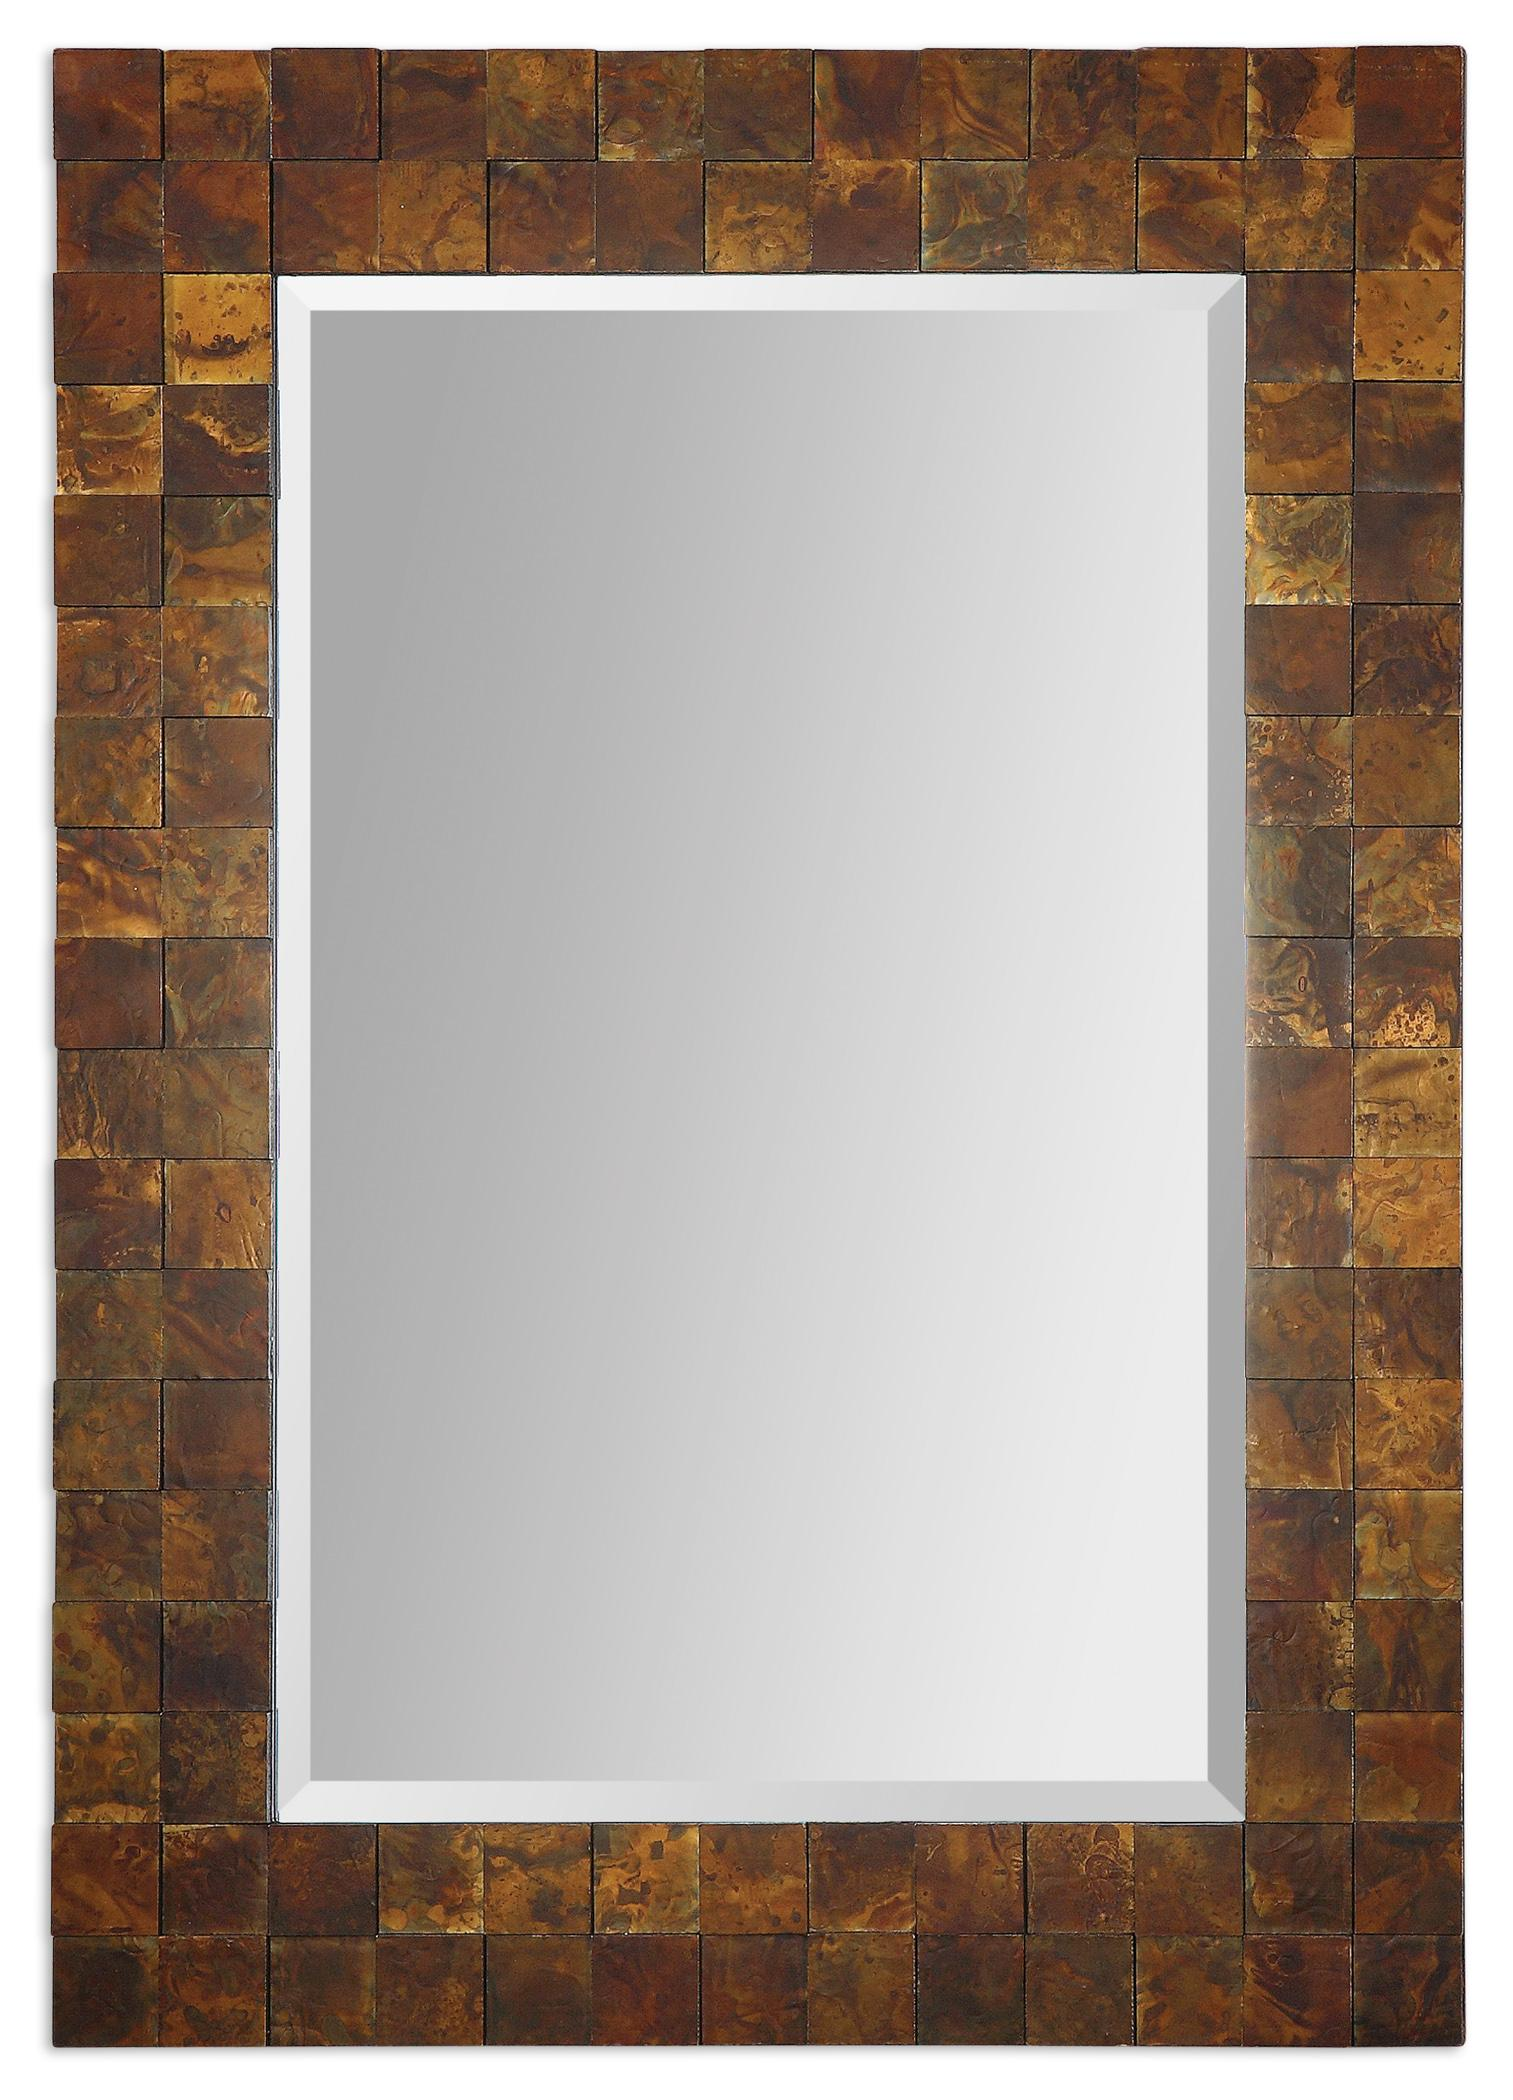 Uttermost Mirrors Ambrosia Copper Mosaic Mirror - Item Number: 07057